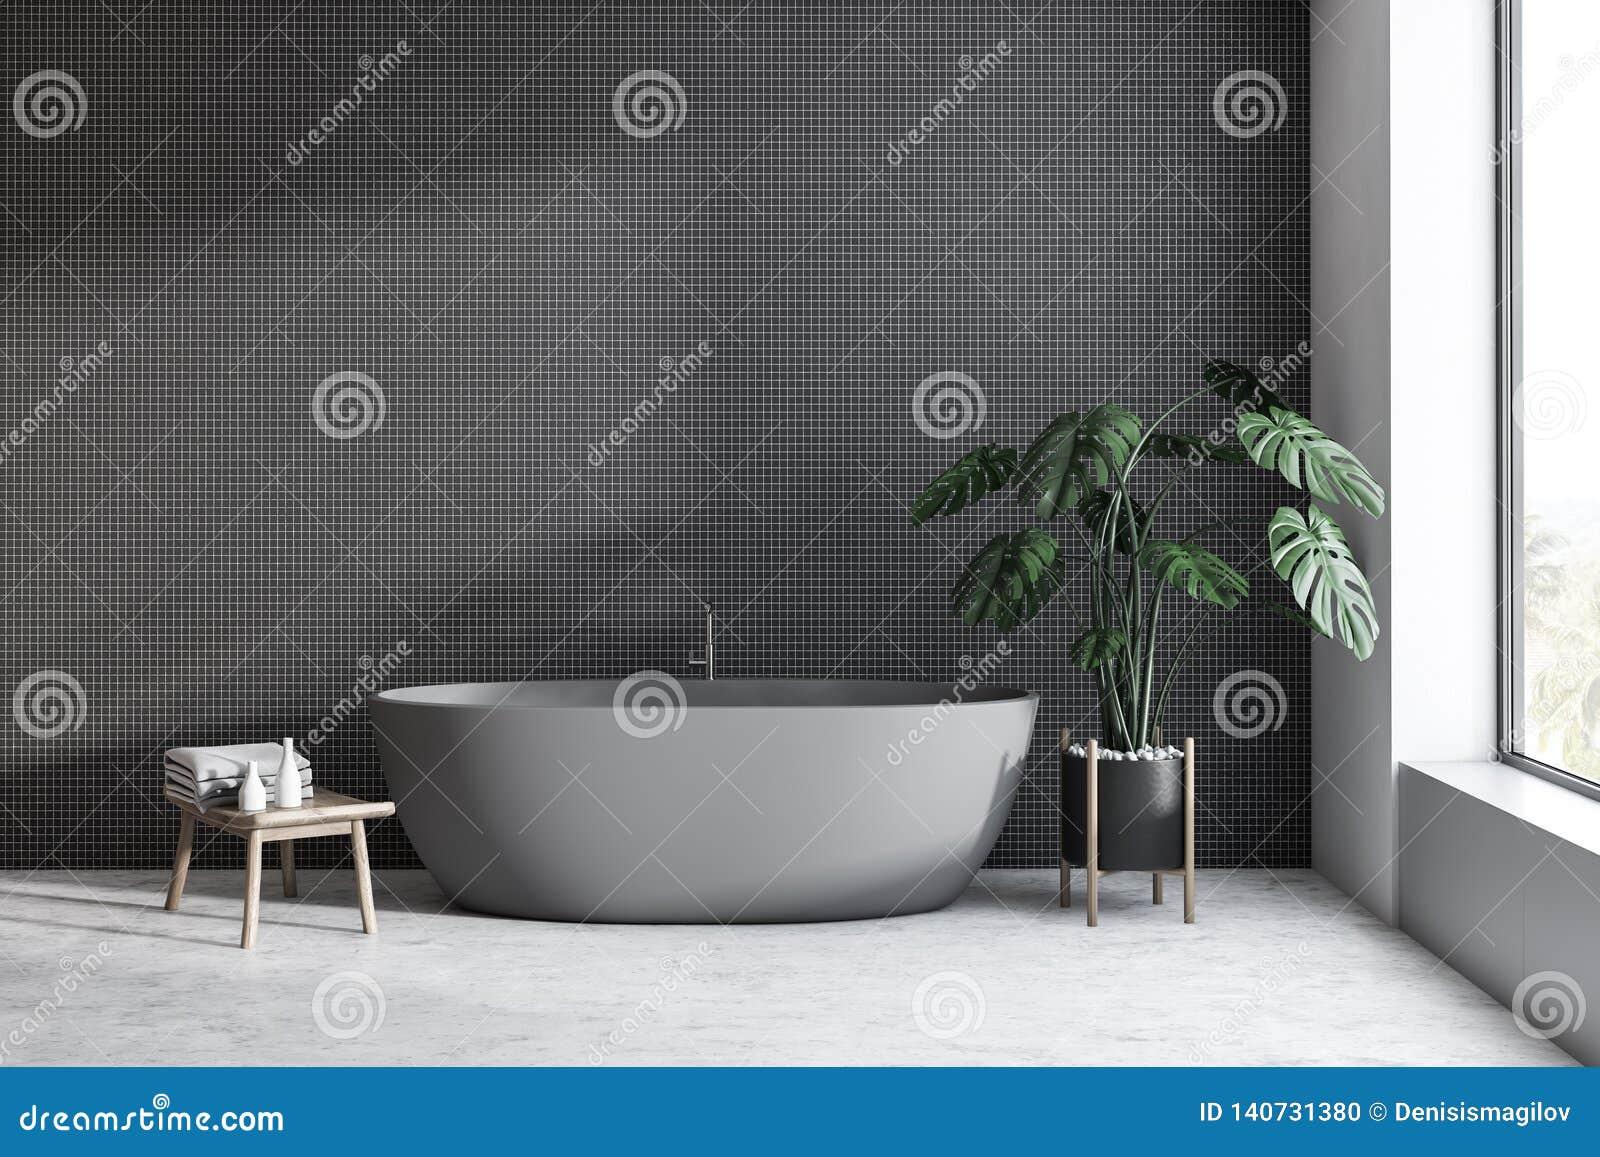 Black Tile Bathroom Interior With Gray Tub Stock Illustration